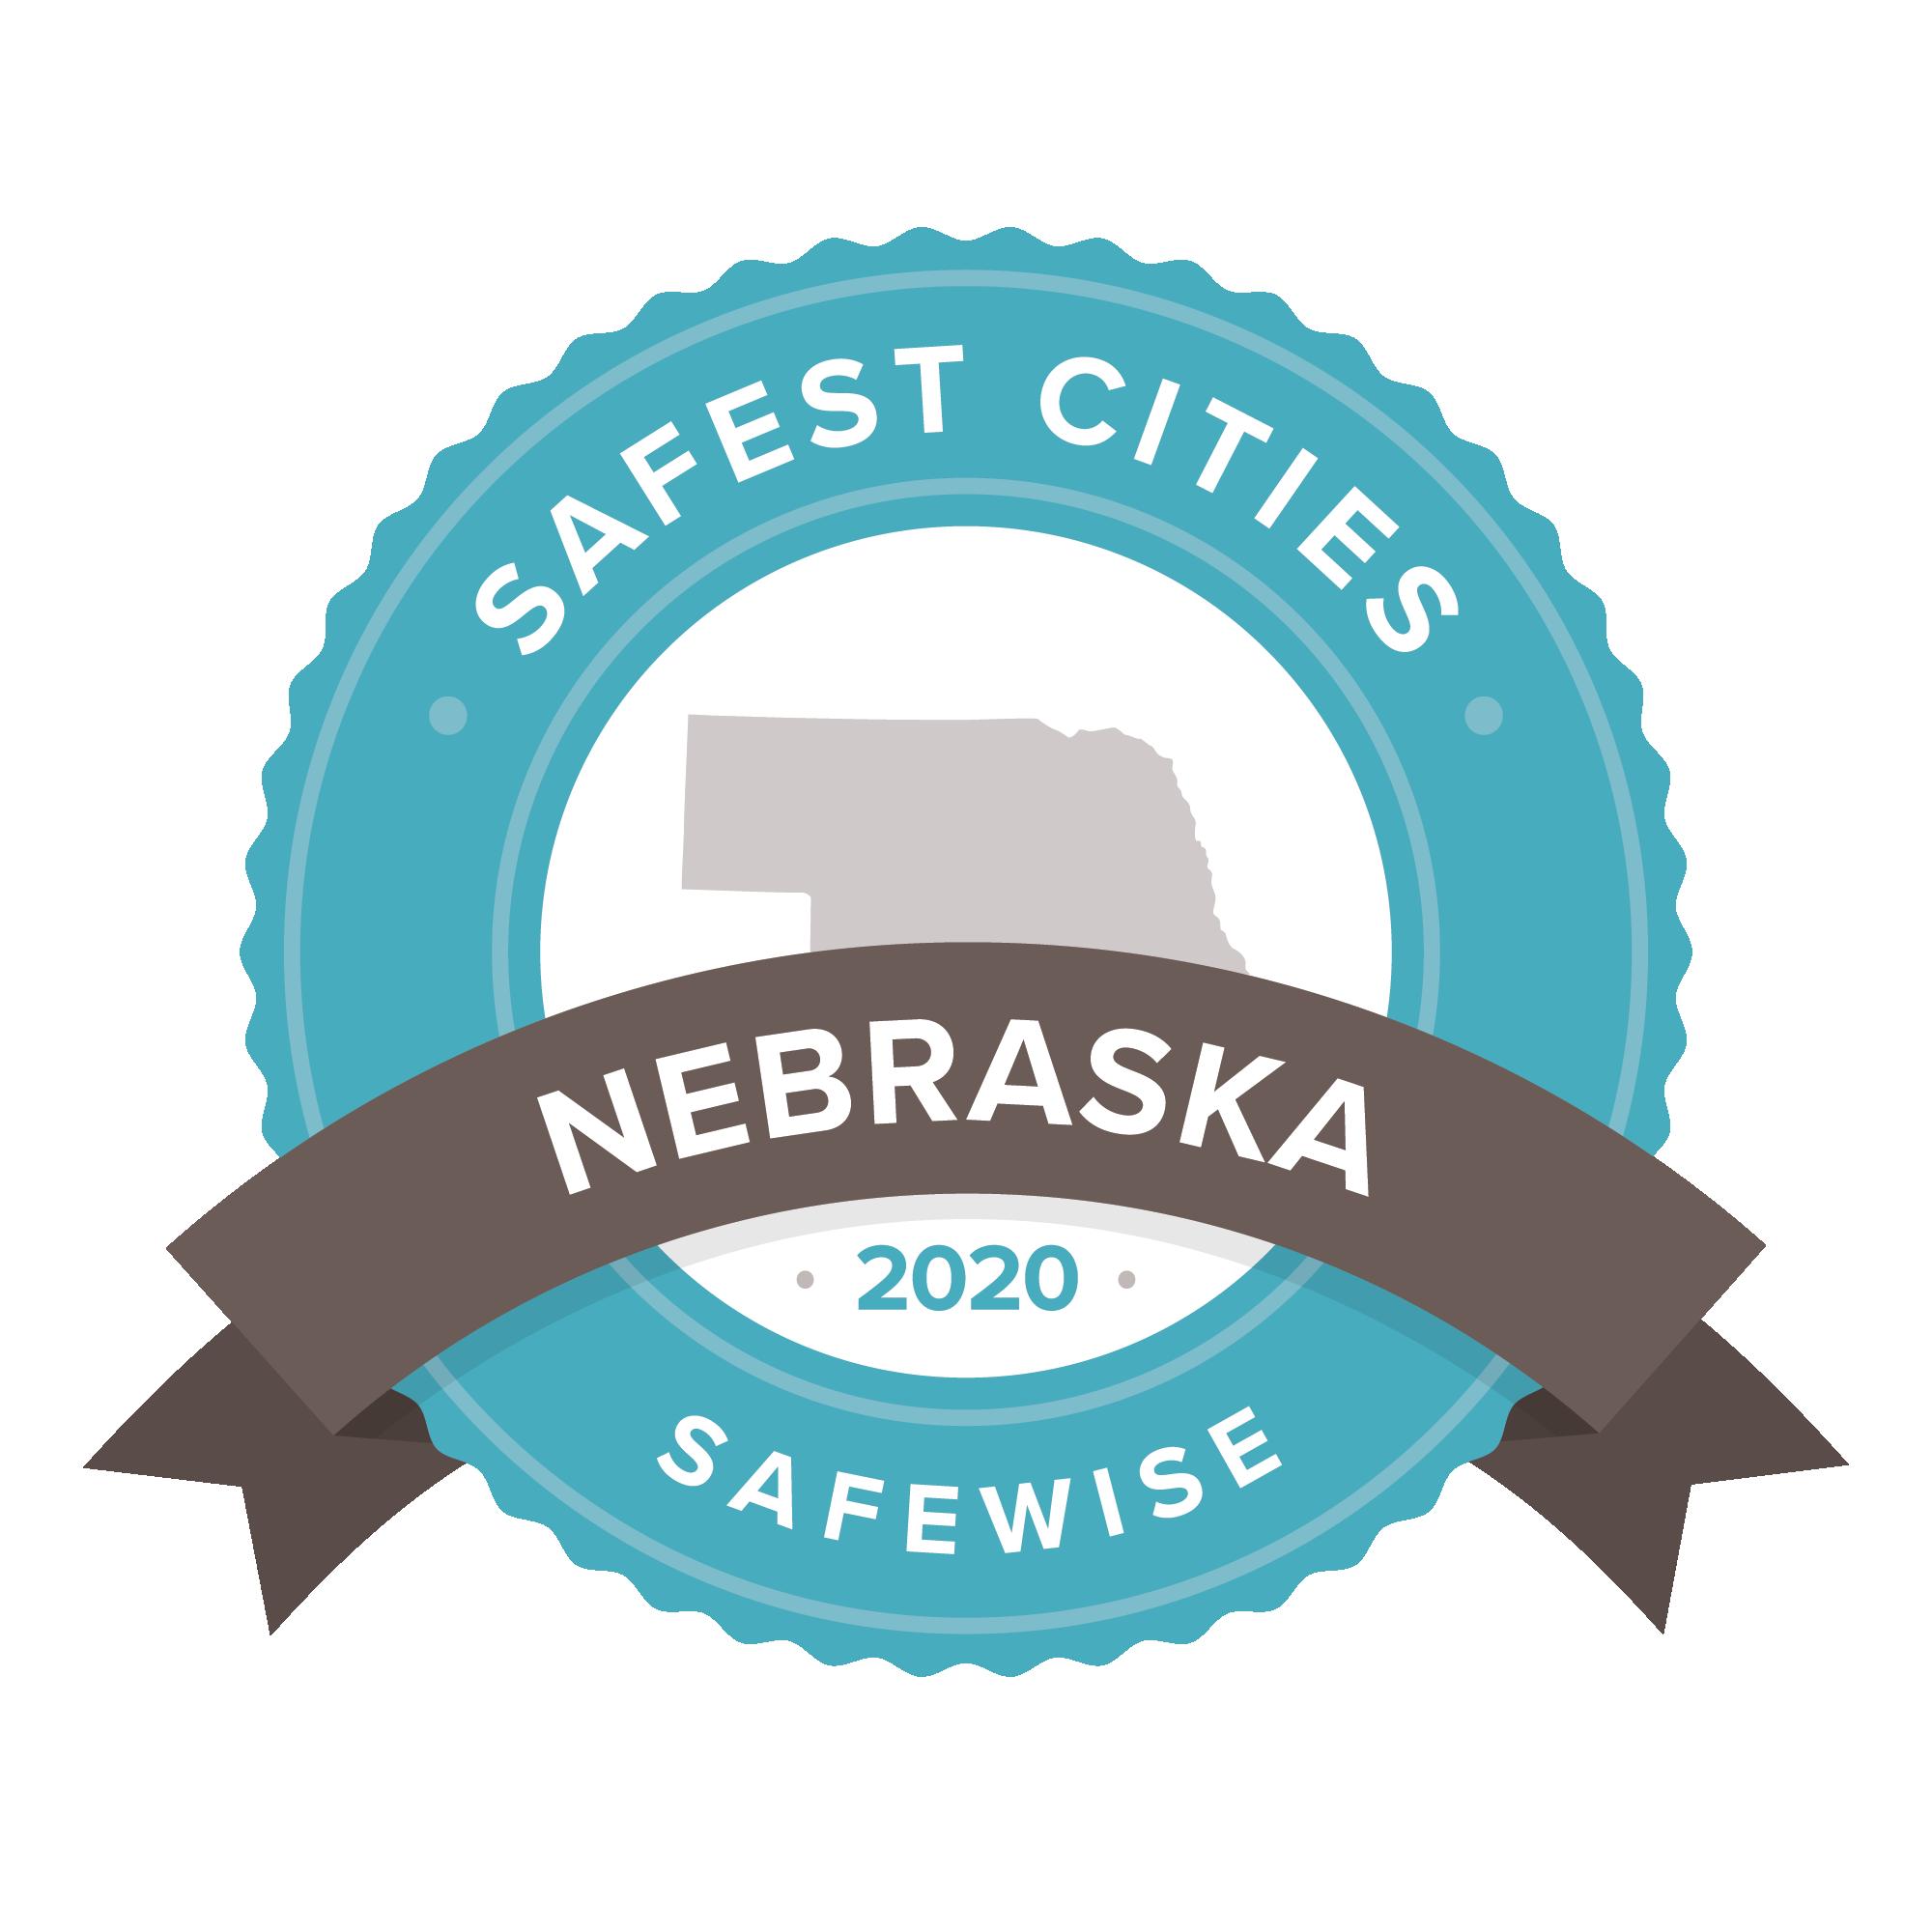 Nebraska safest cities badge